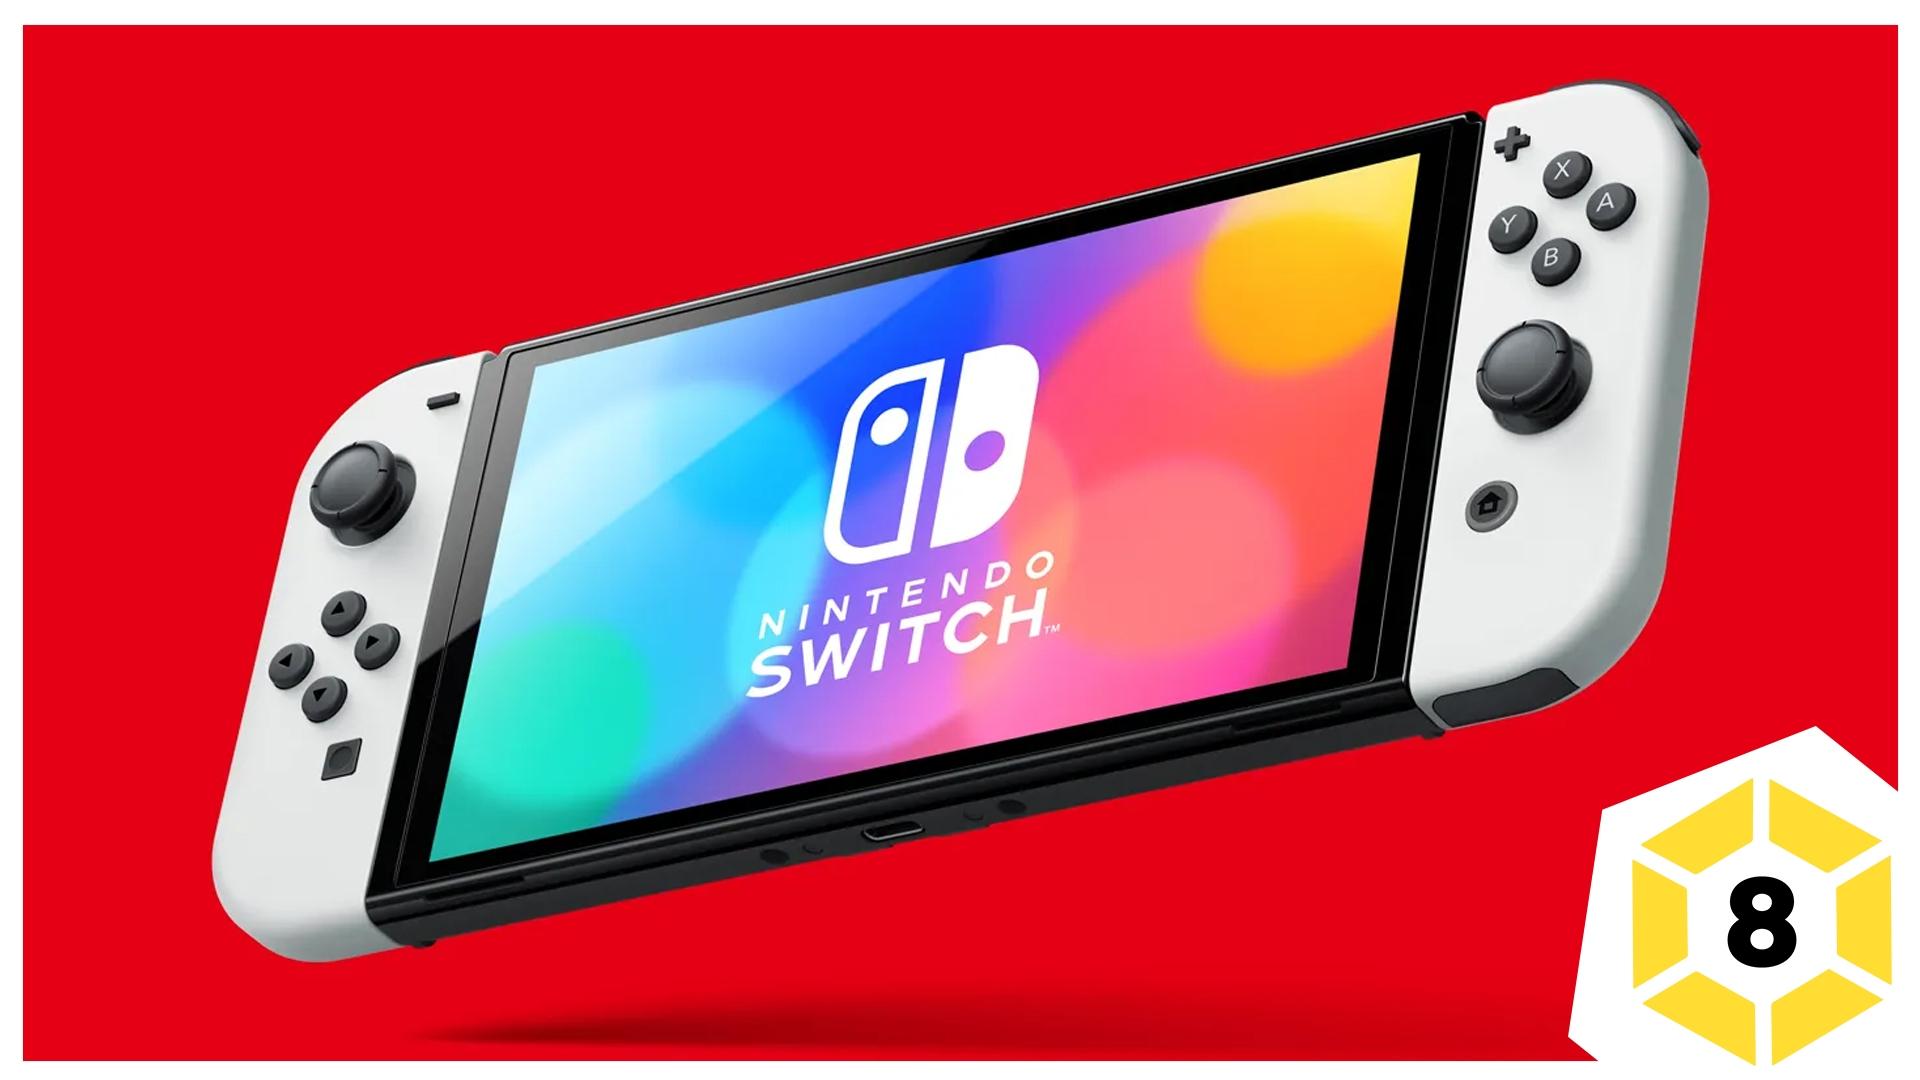 Nintendo-Switch-OLED-Review-Hero